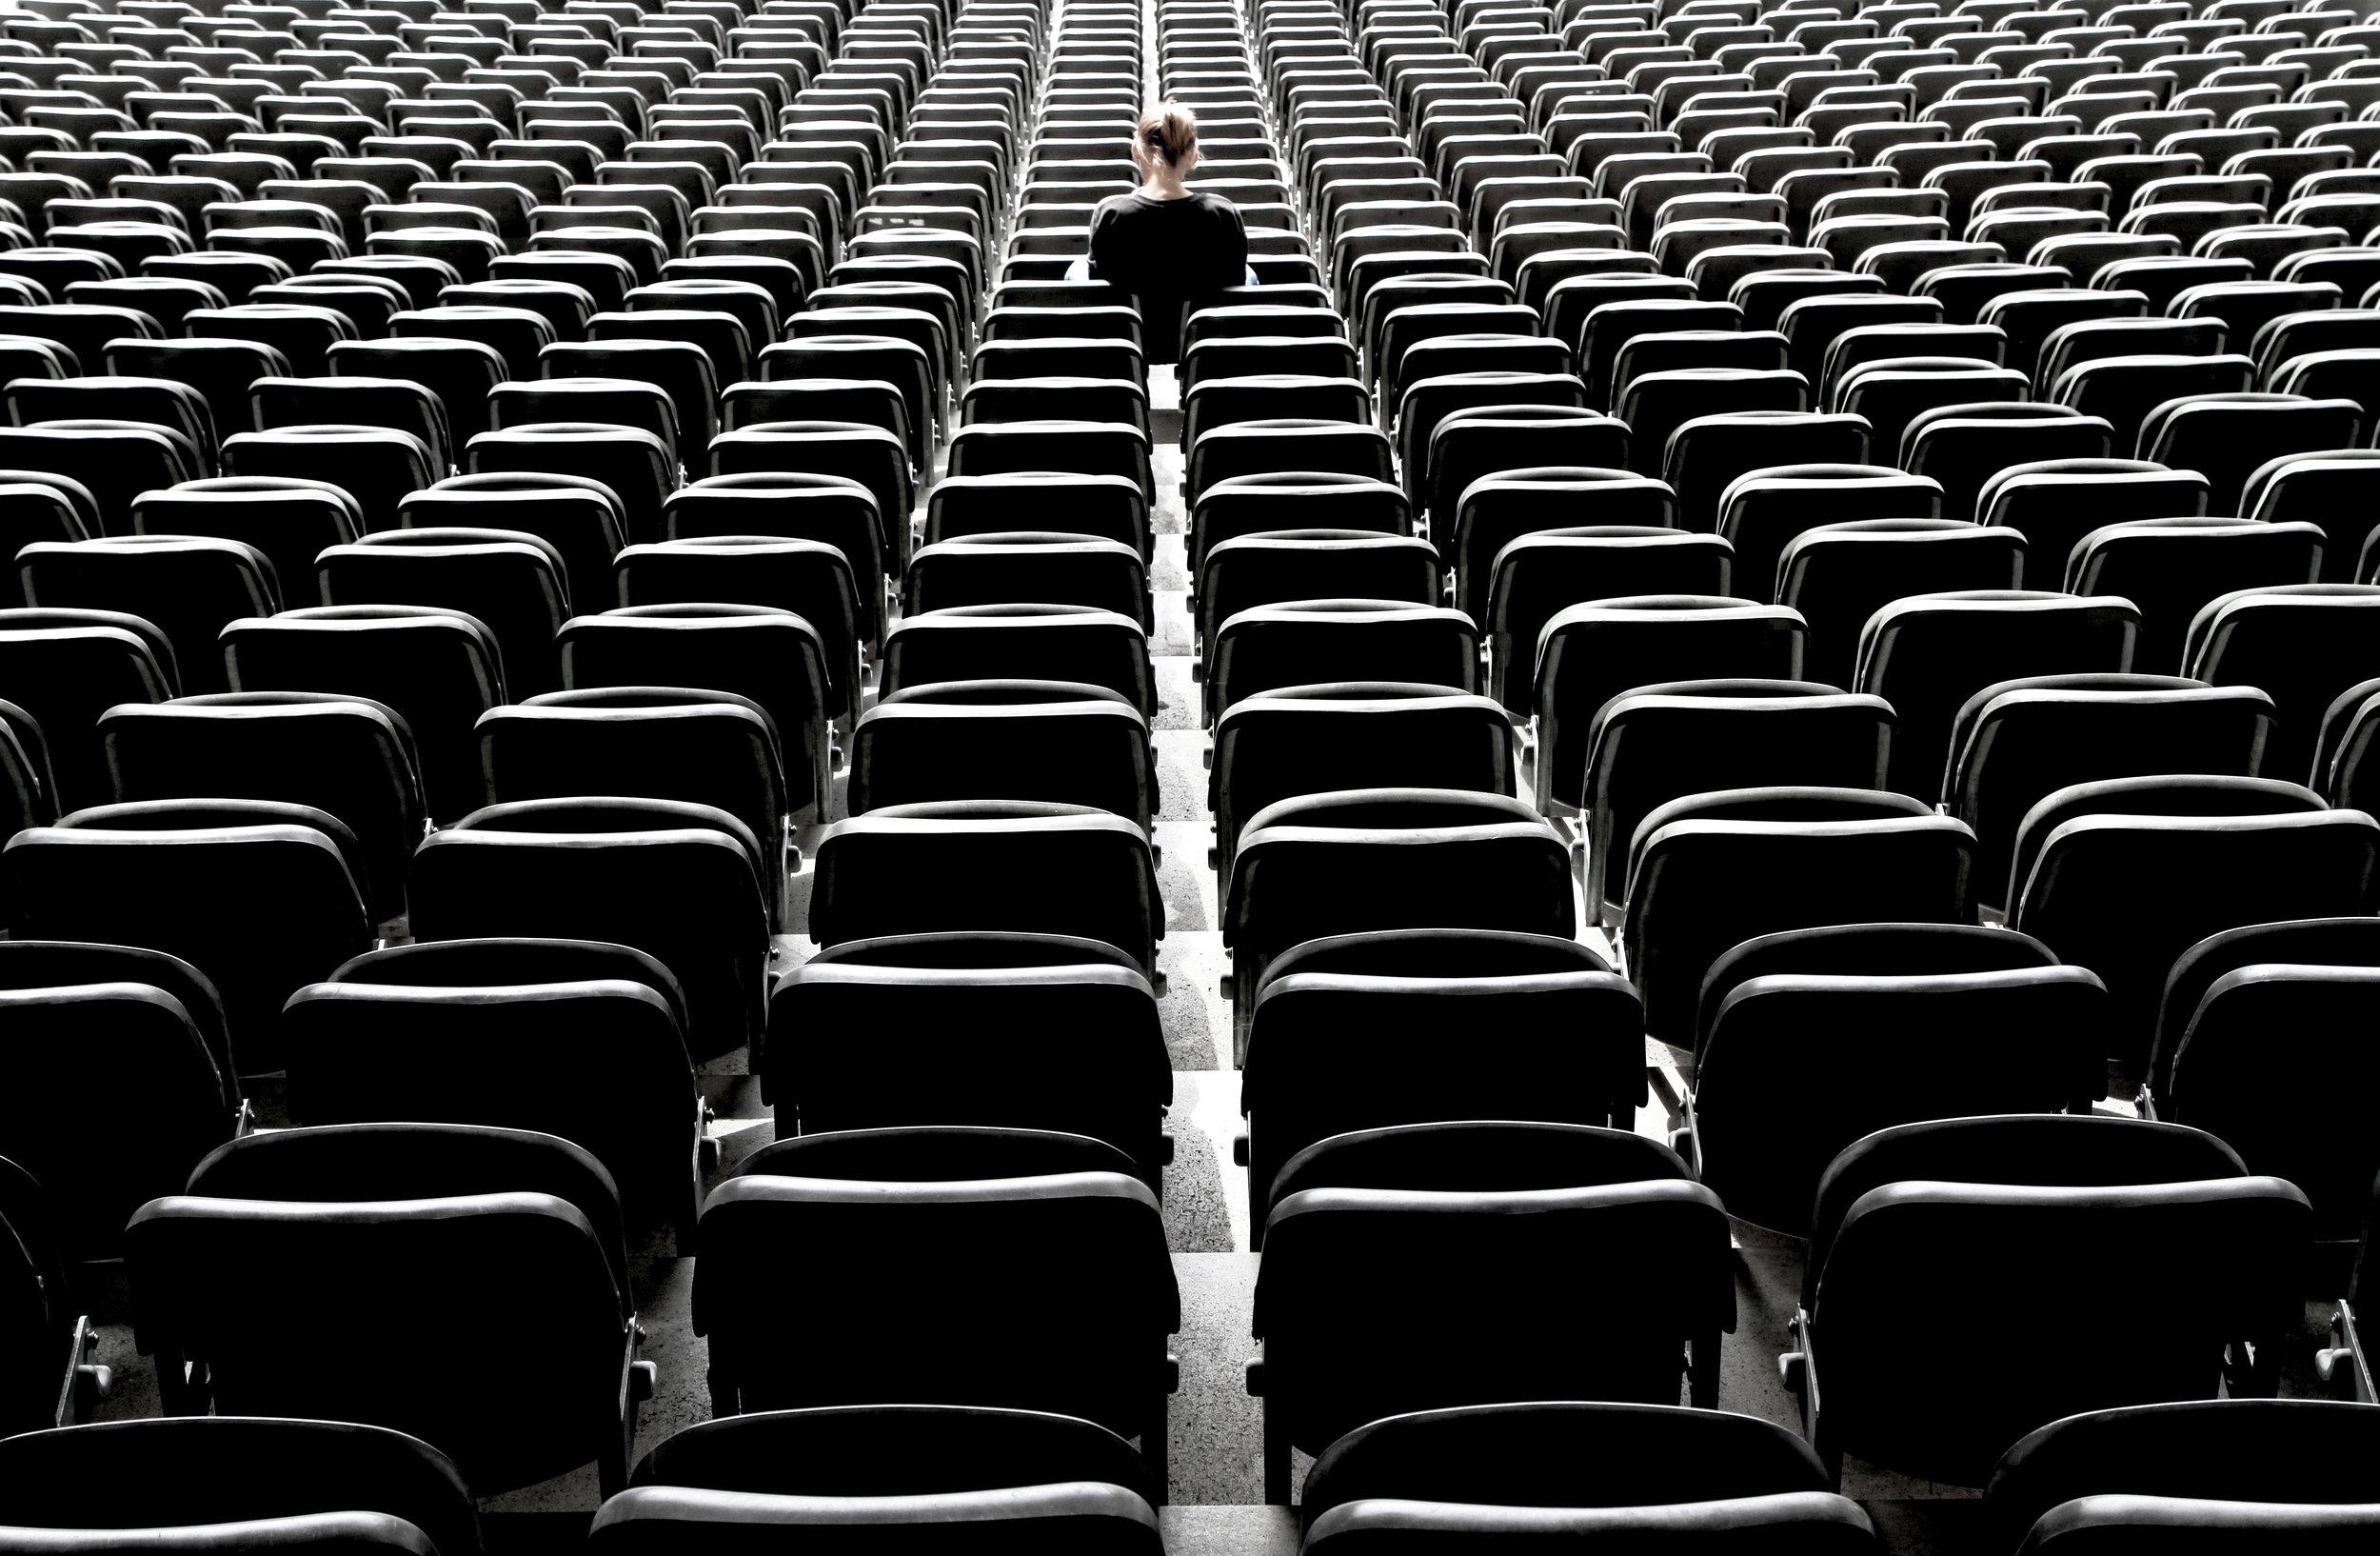 Going_Alone_GFTG.jpeg